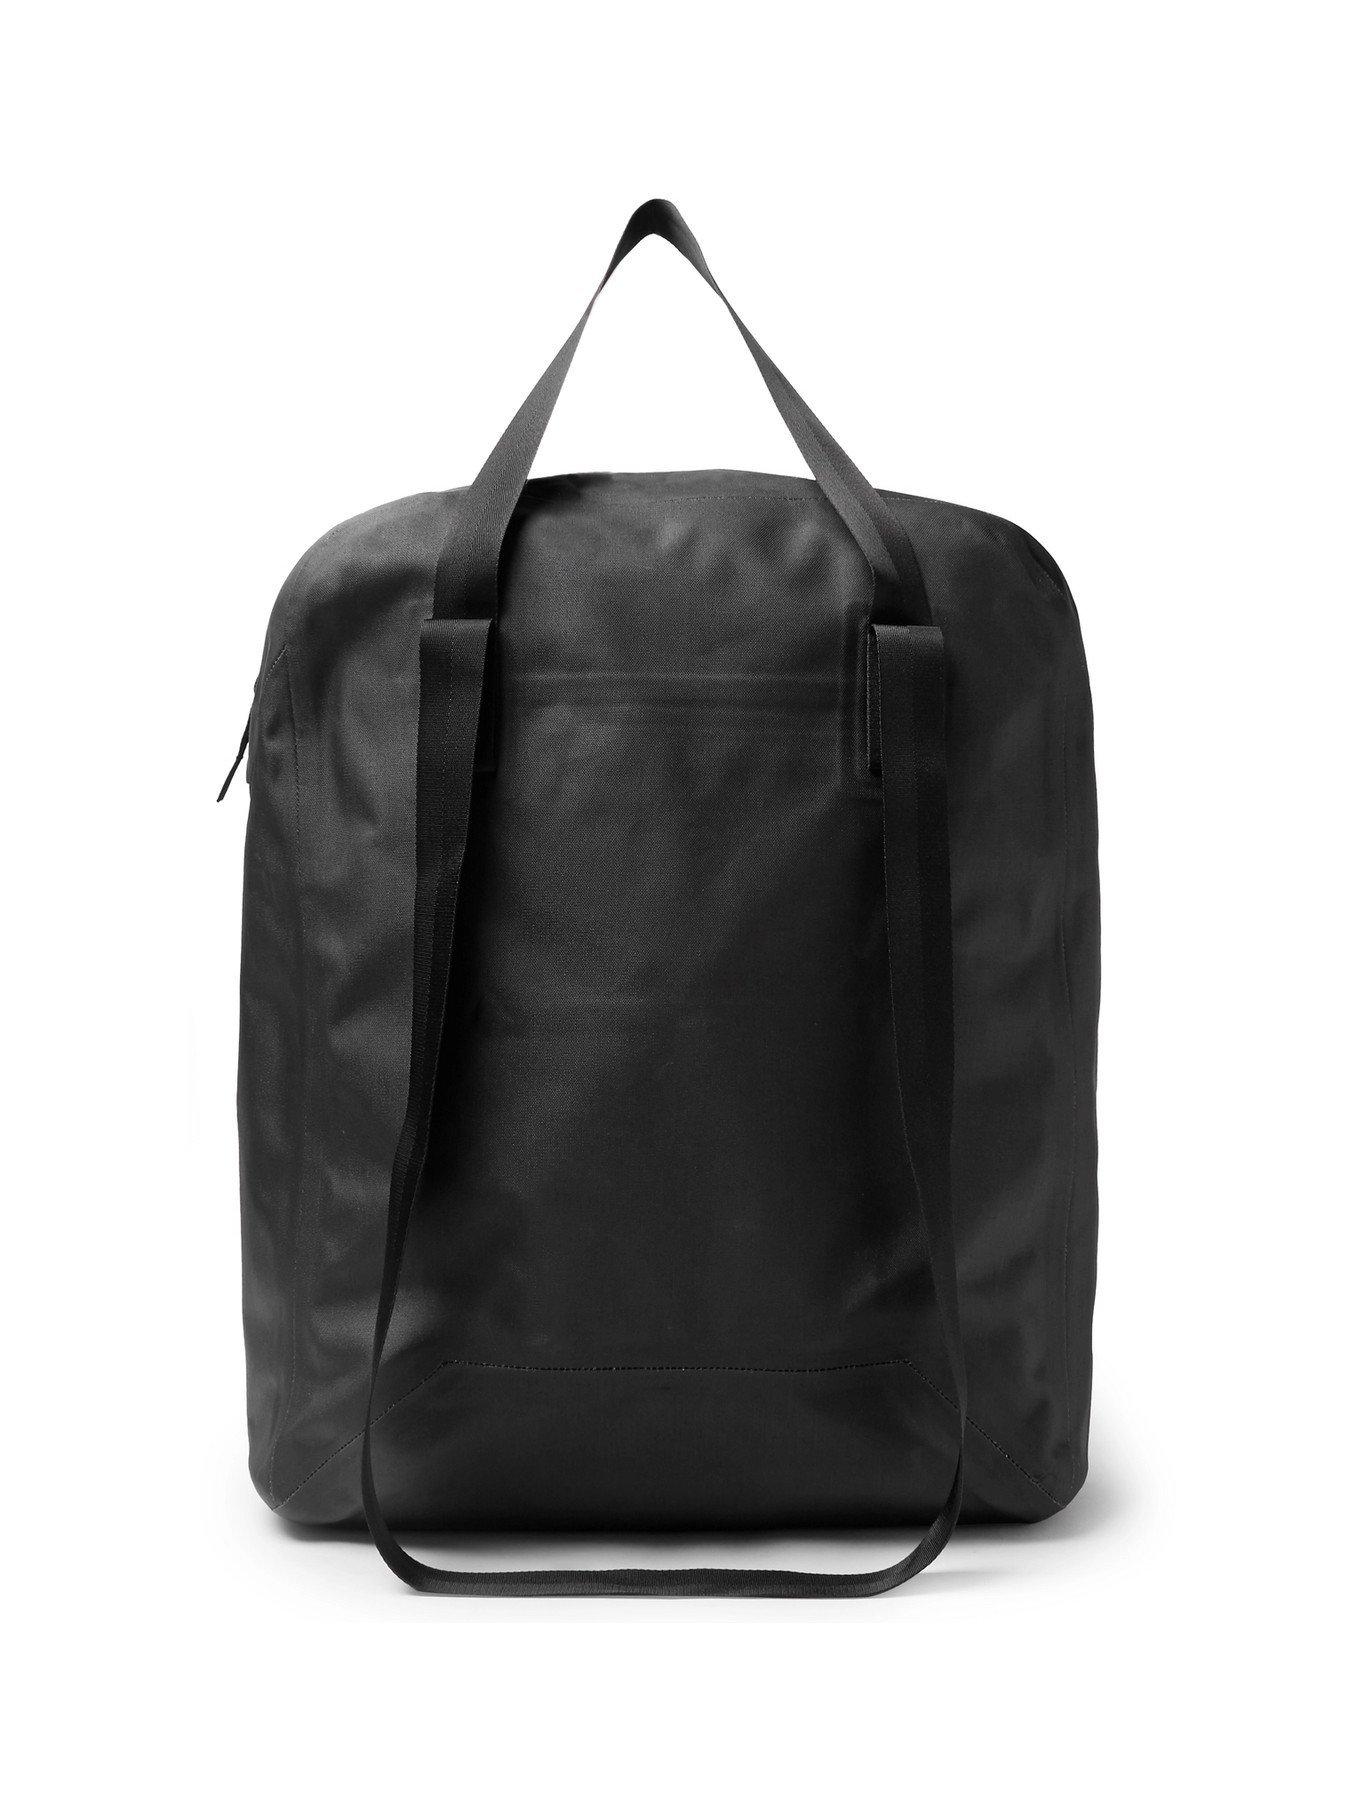 Photo: VEILANCE - Seque Shell Tote Bag - Black